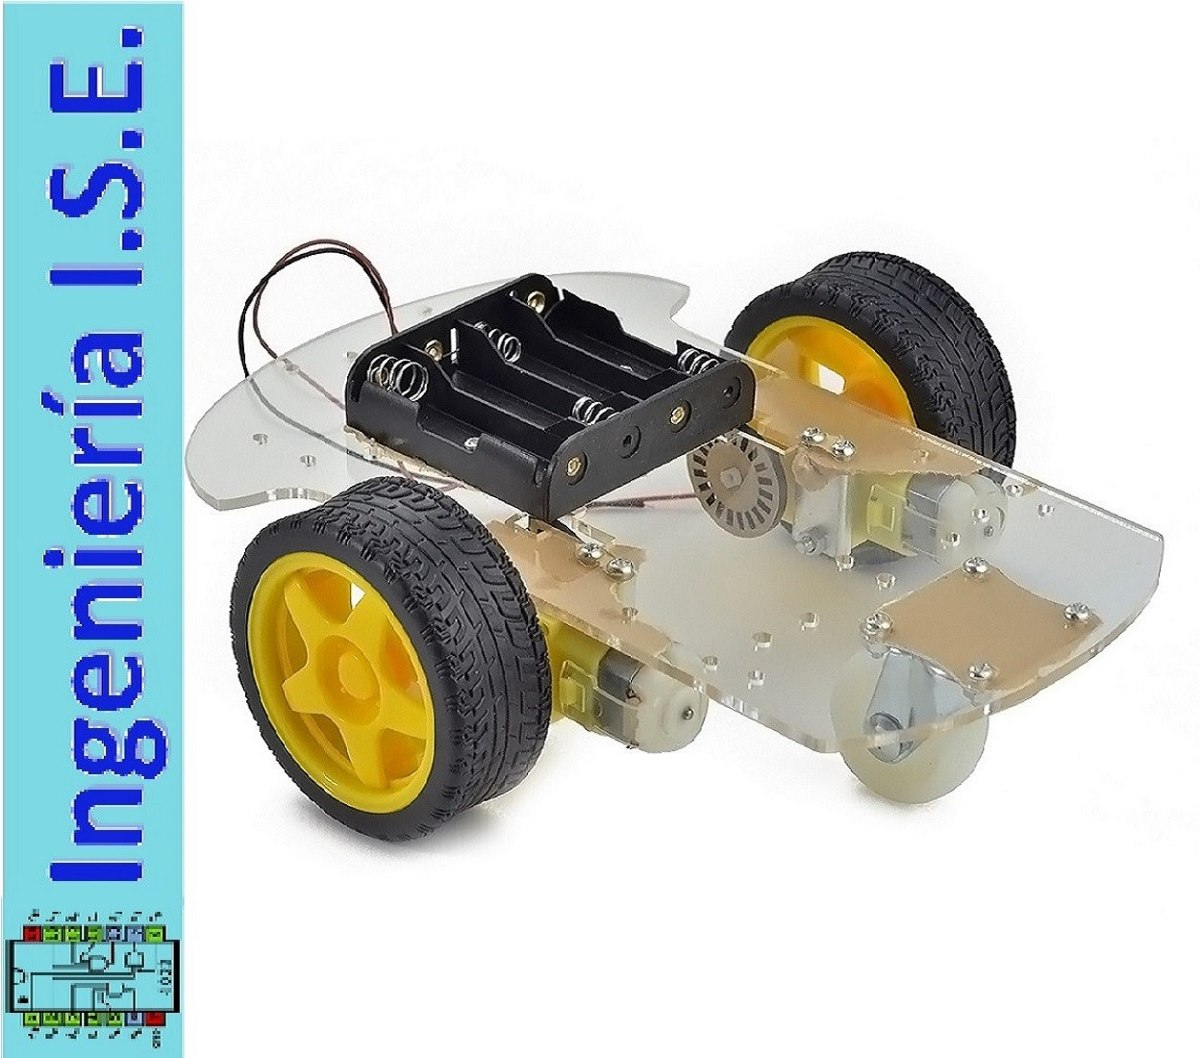 Kit chasis carro robot wd para arduino pic ¡ sé el mejor